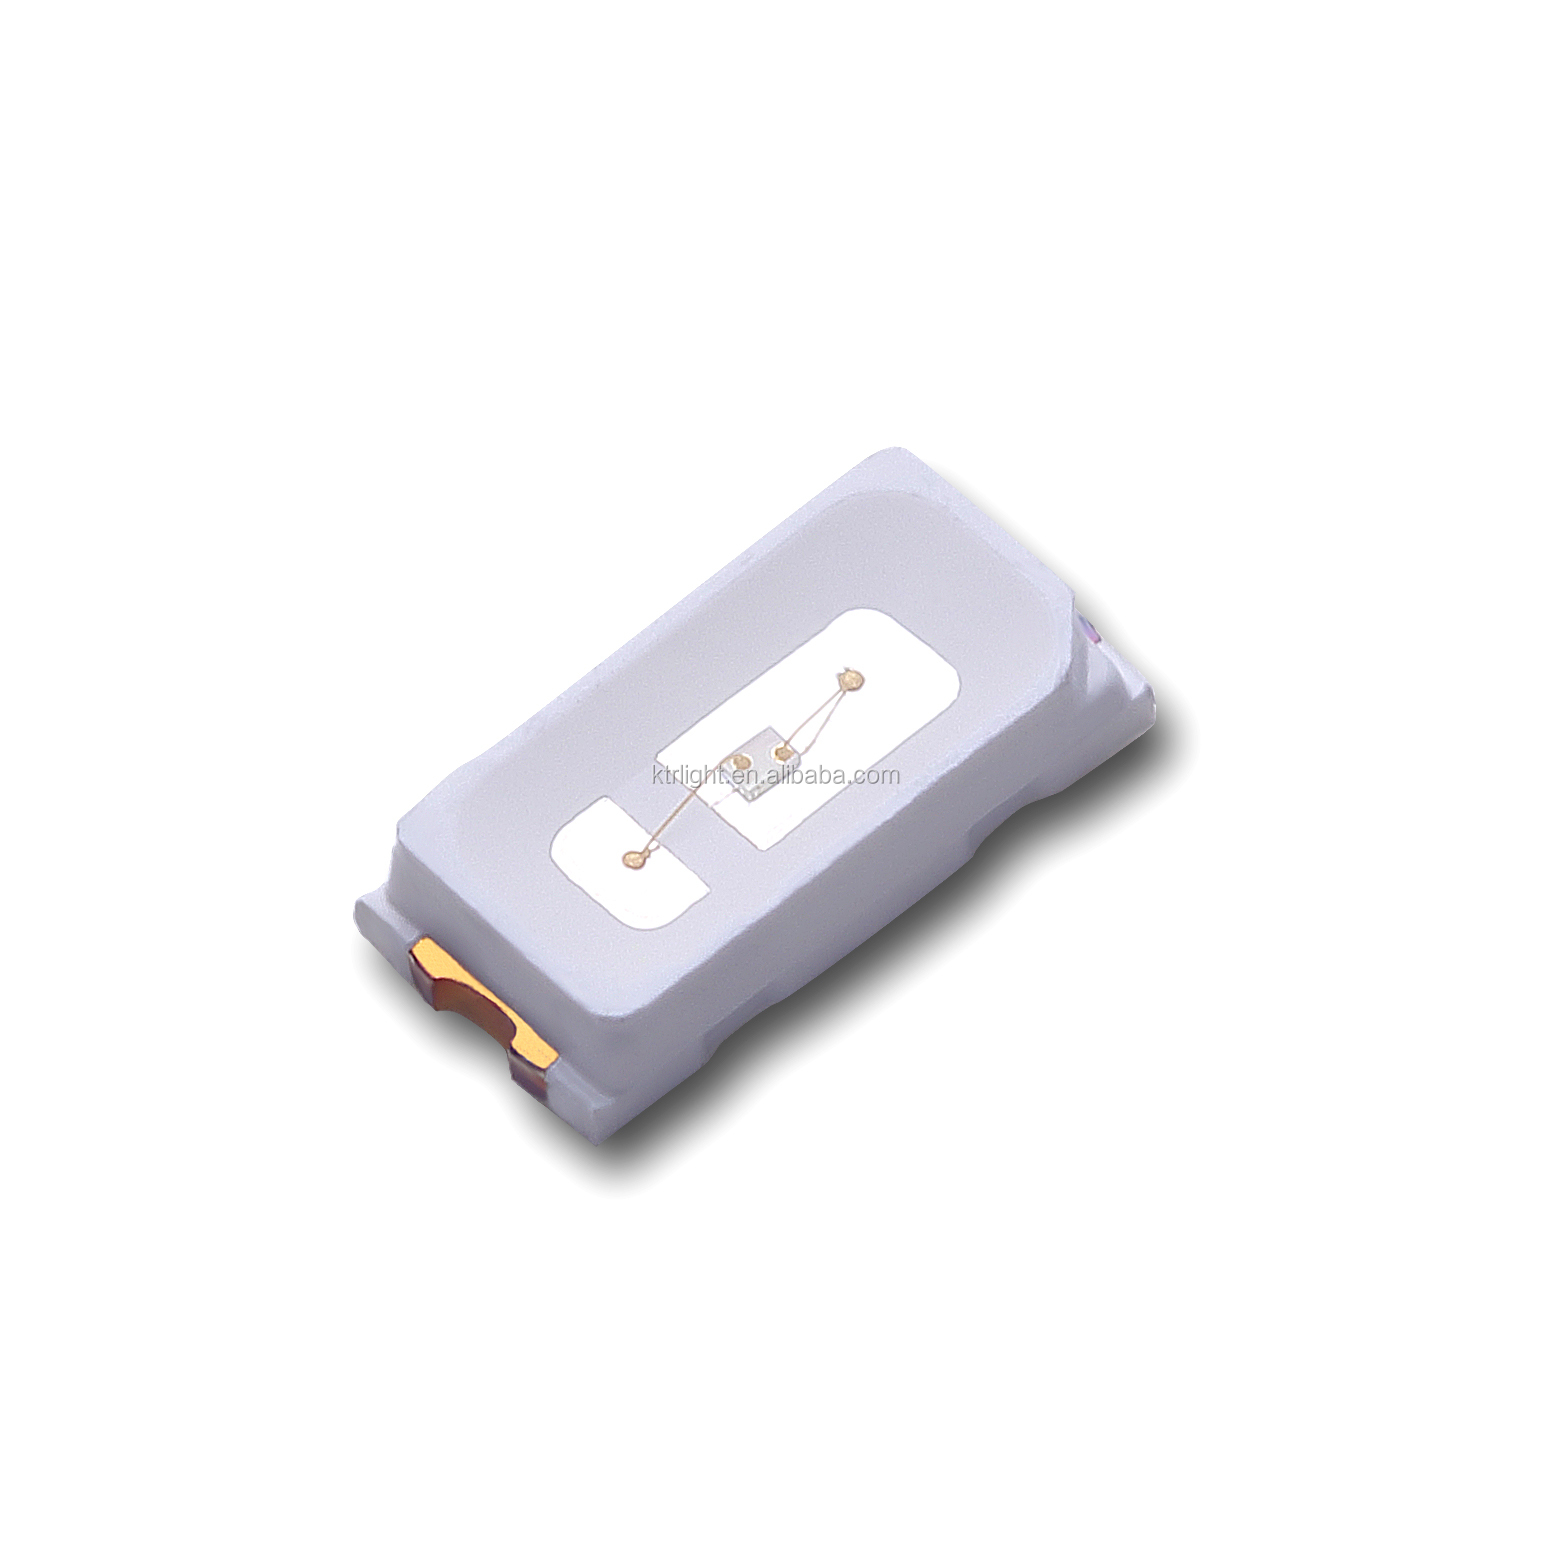 China manufacturer LM-80 3014 smd led epistar/sanan chip white